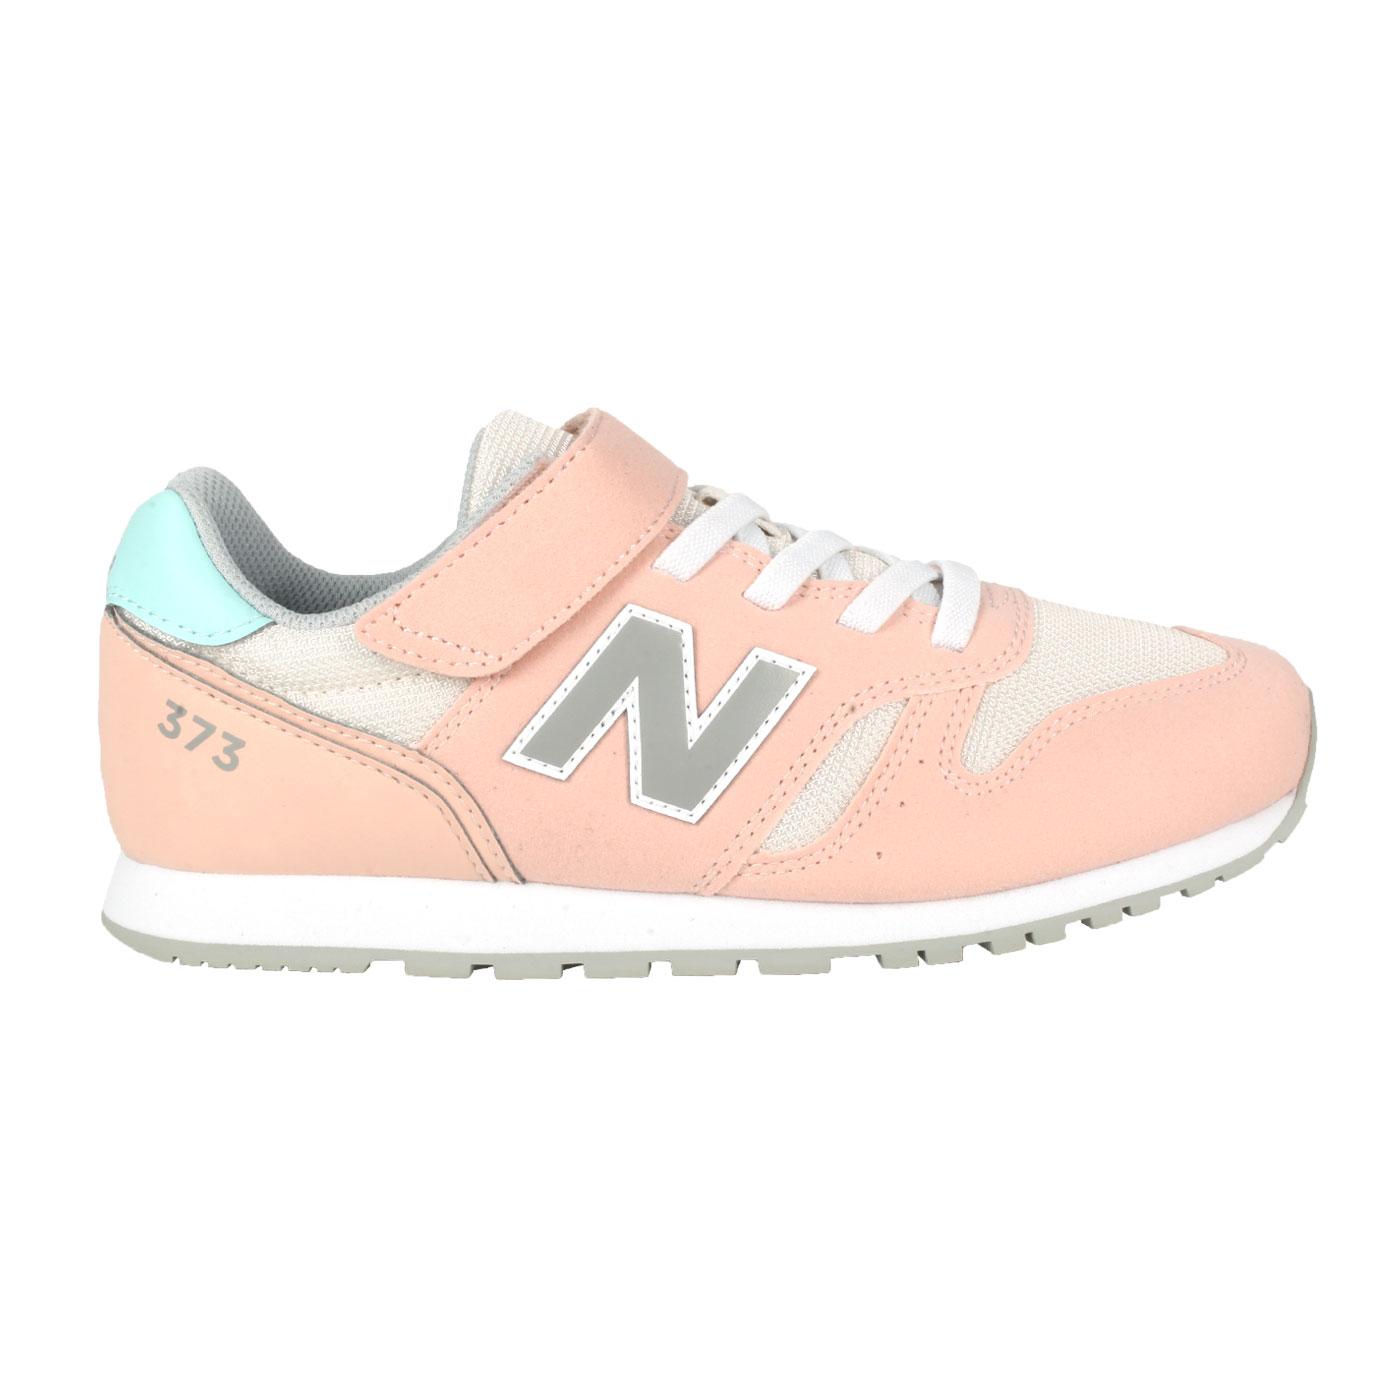 NEW BALANCE 中童休閒運動鞋-WIDE YV373CP2 - 粉橘灰藍